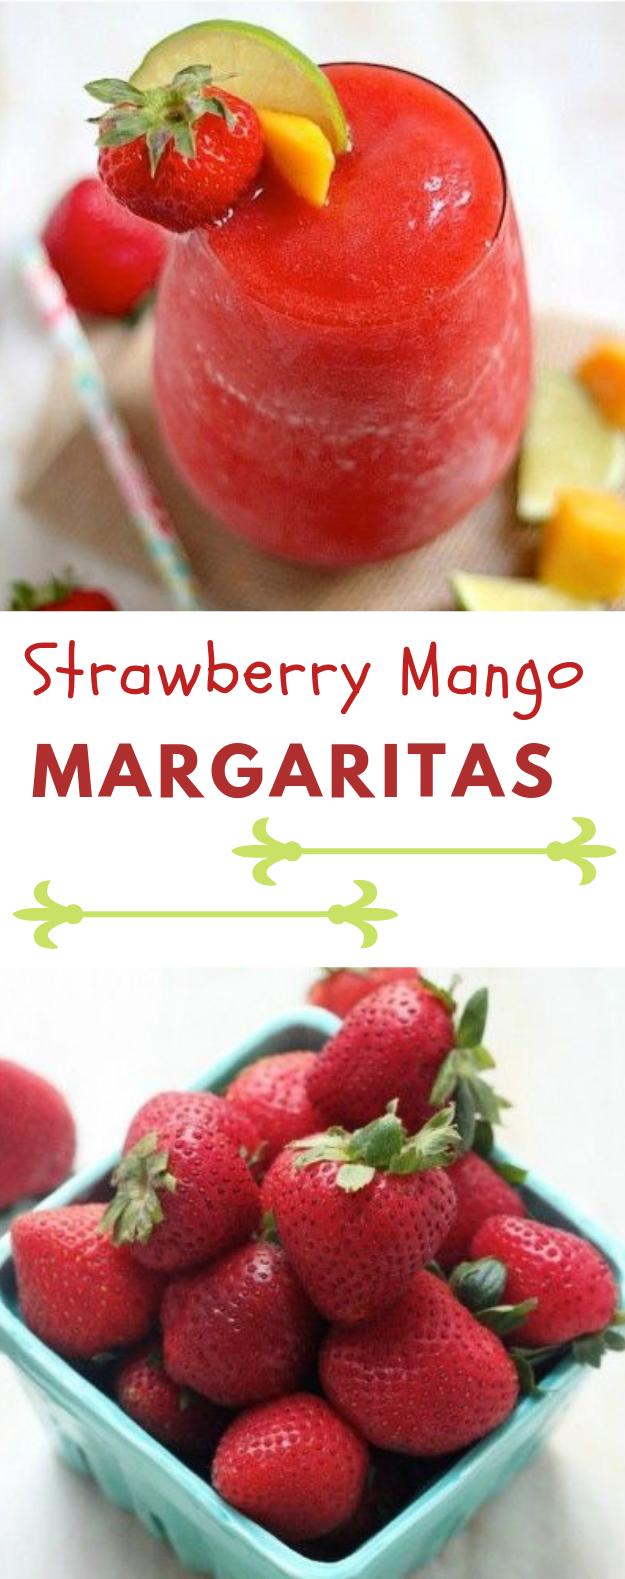 Strawberry Mango Margaritas #healthydrink #margaritas